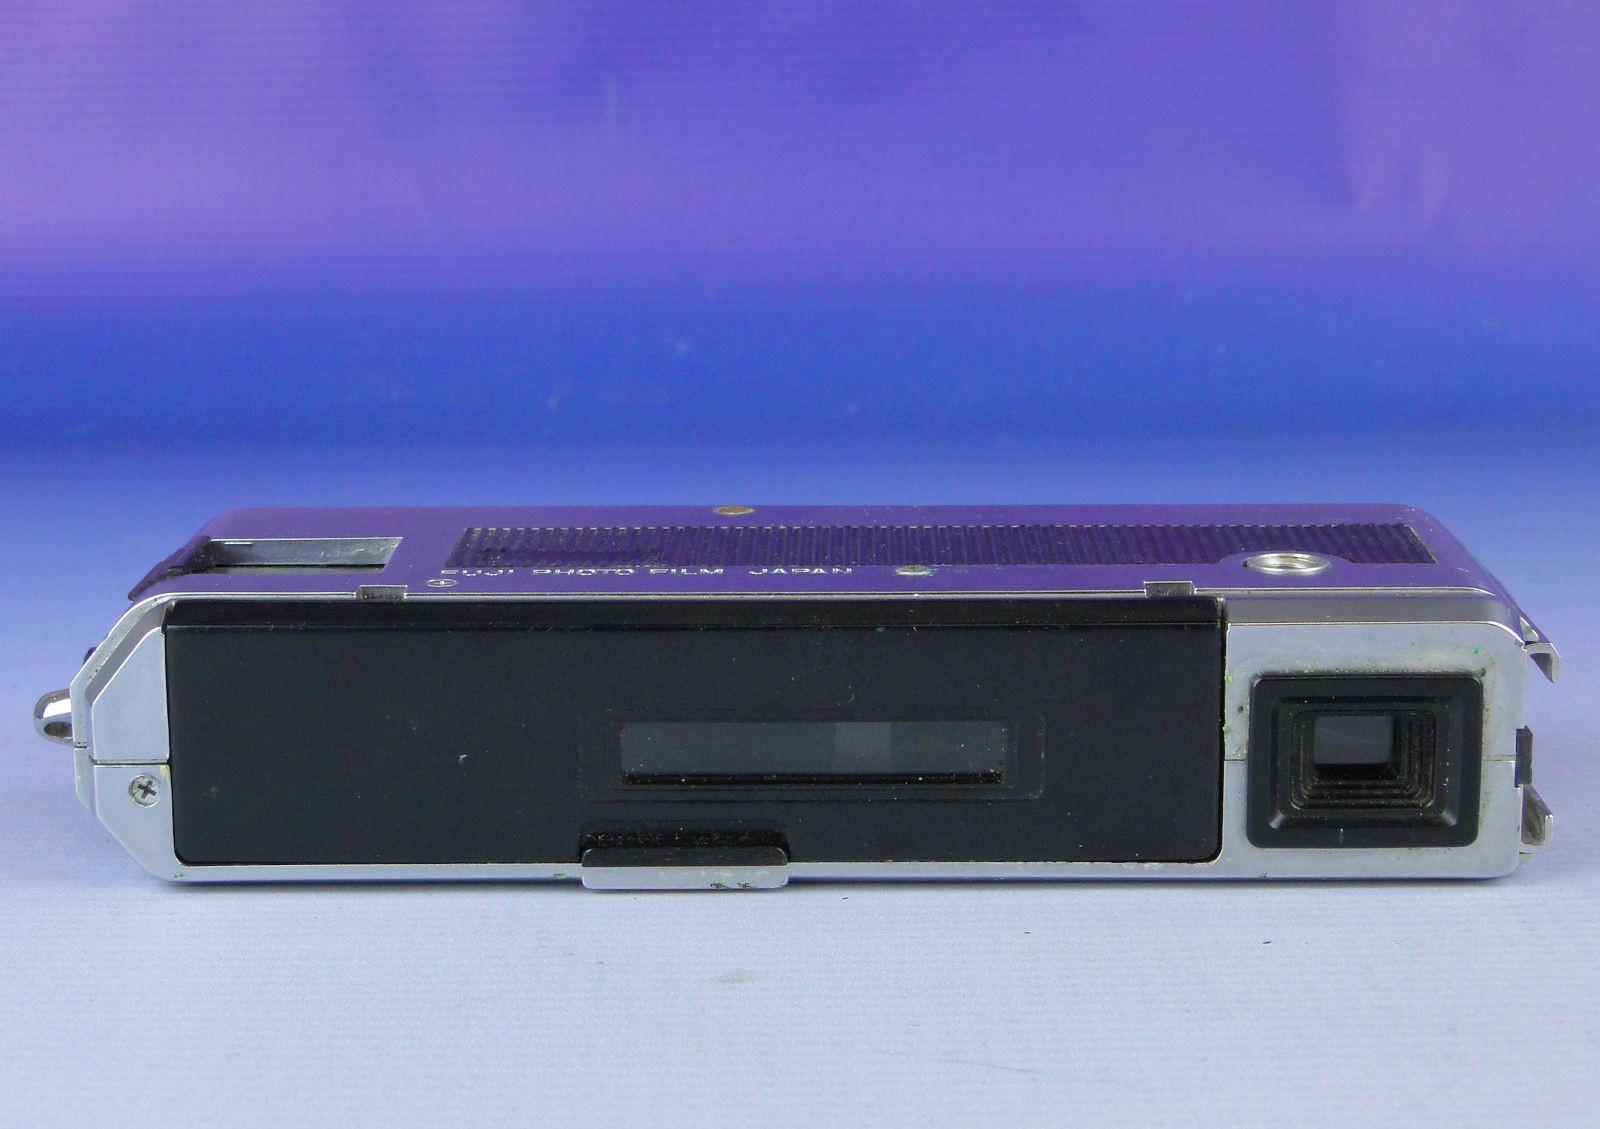 DSC07477.JPG (1600×1129)